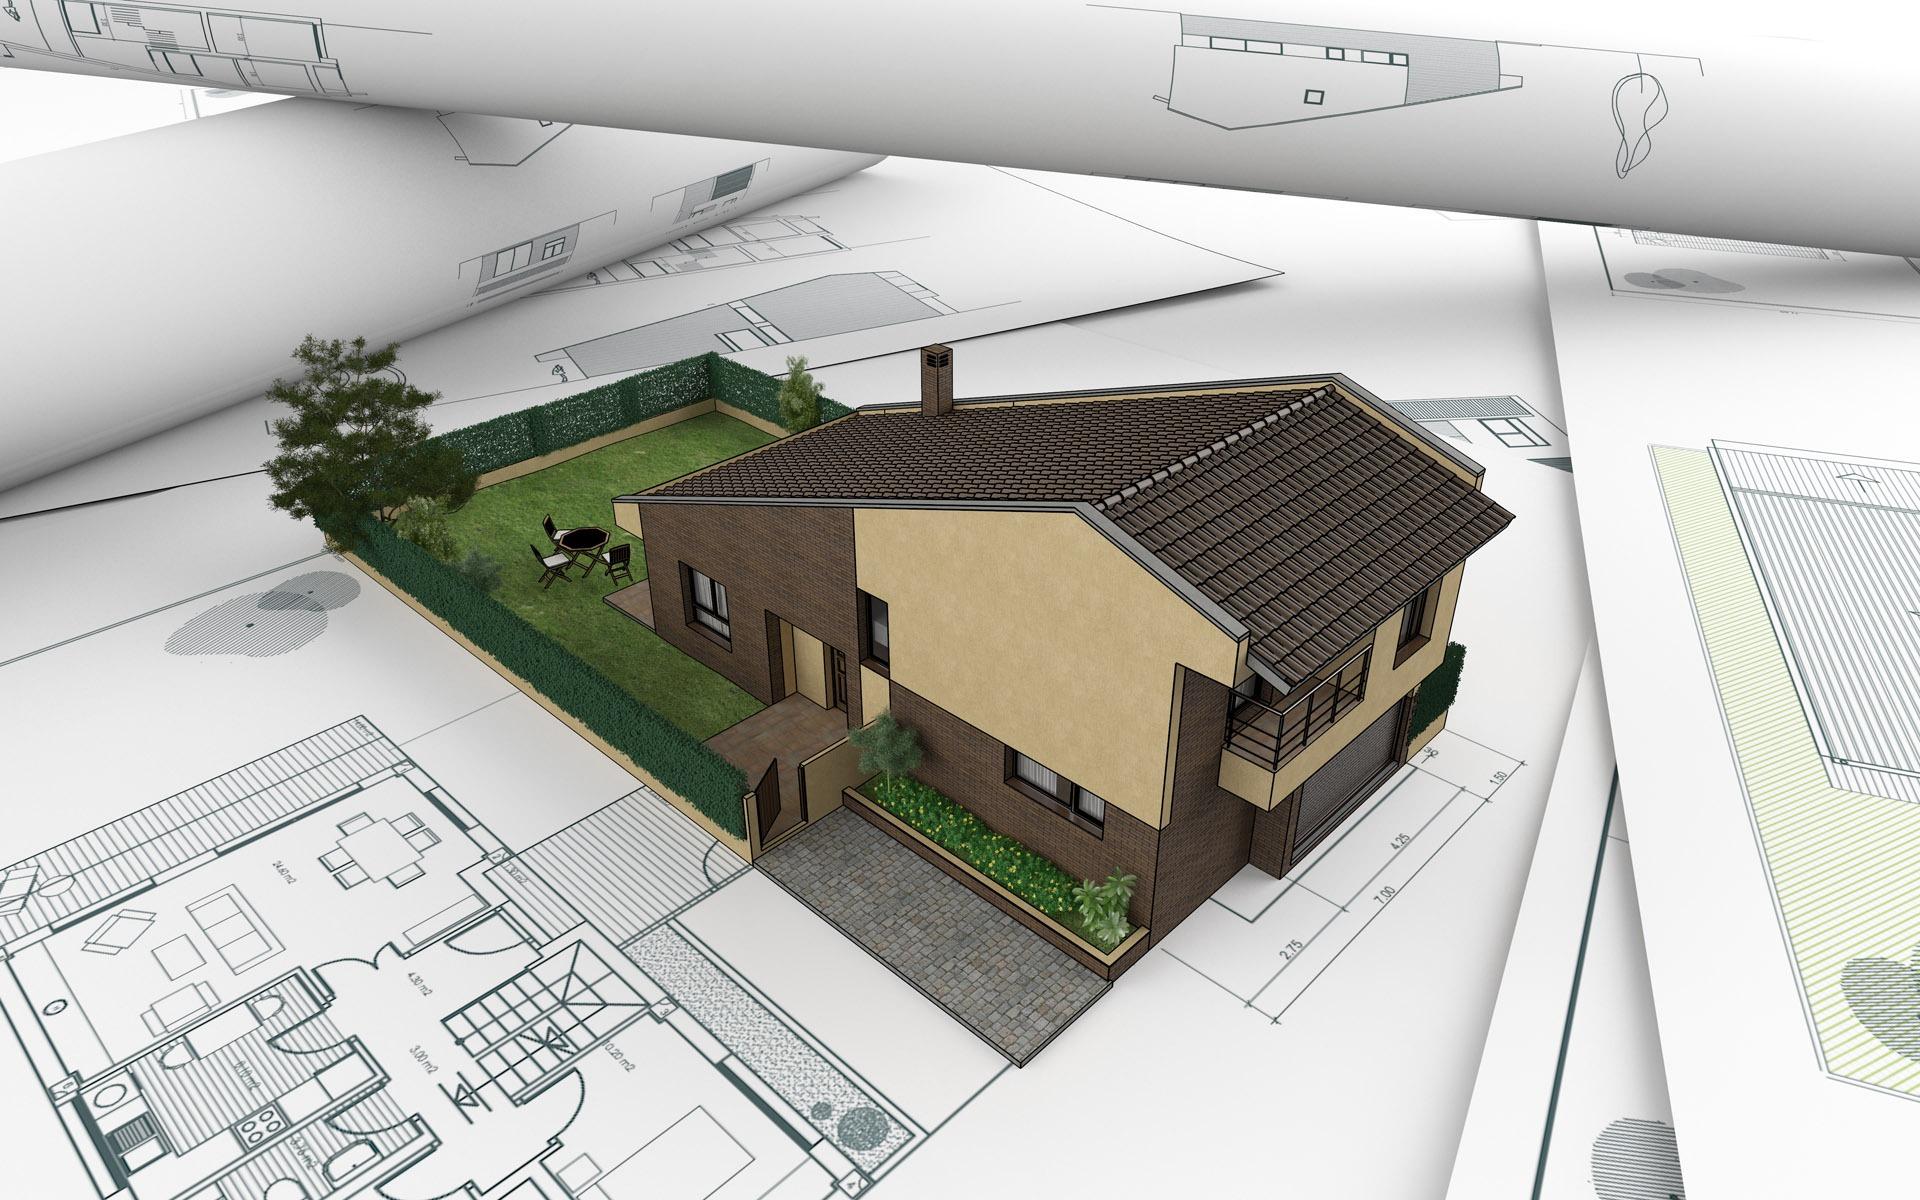 3d Architectural Design Wallpaper 1 14 1920x1200